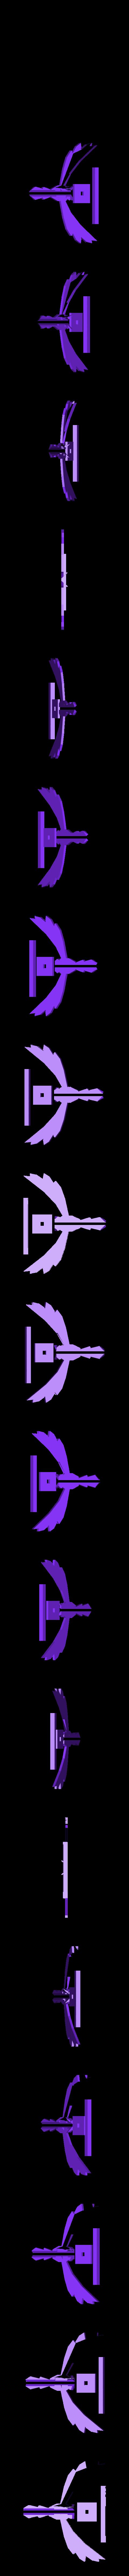 balance bird.STL Download free STL file balance bird • Object to 3D print, sergioinglese